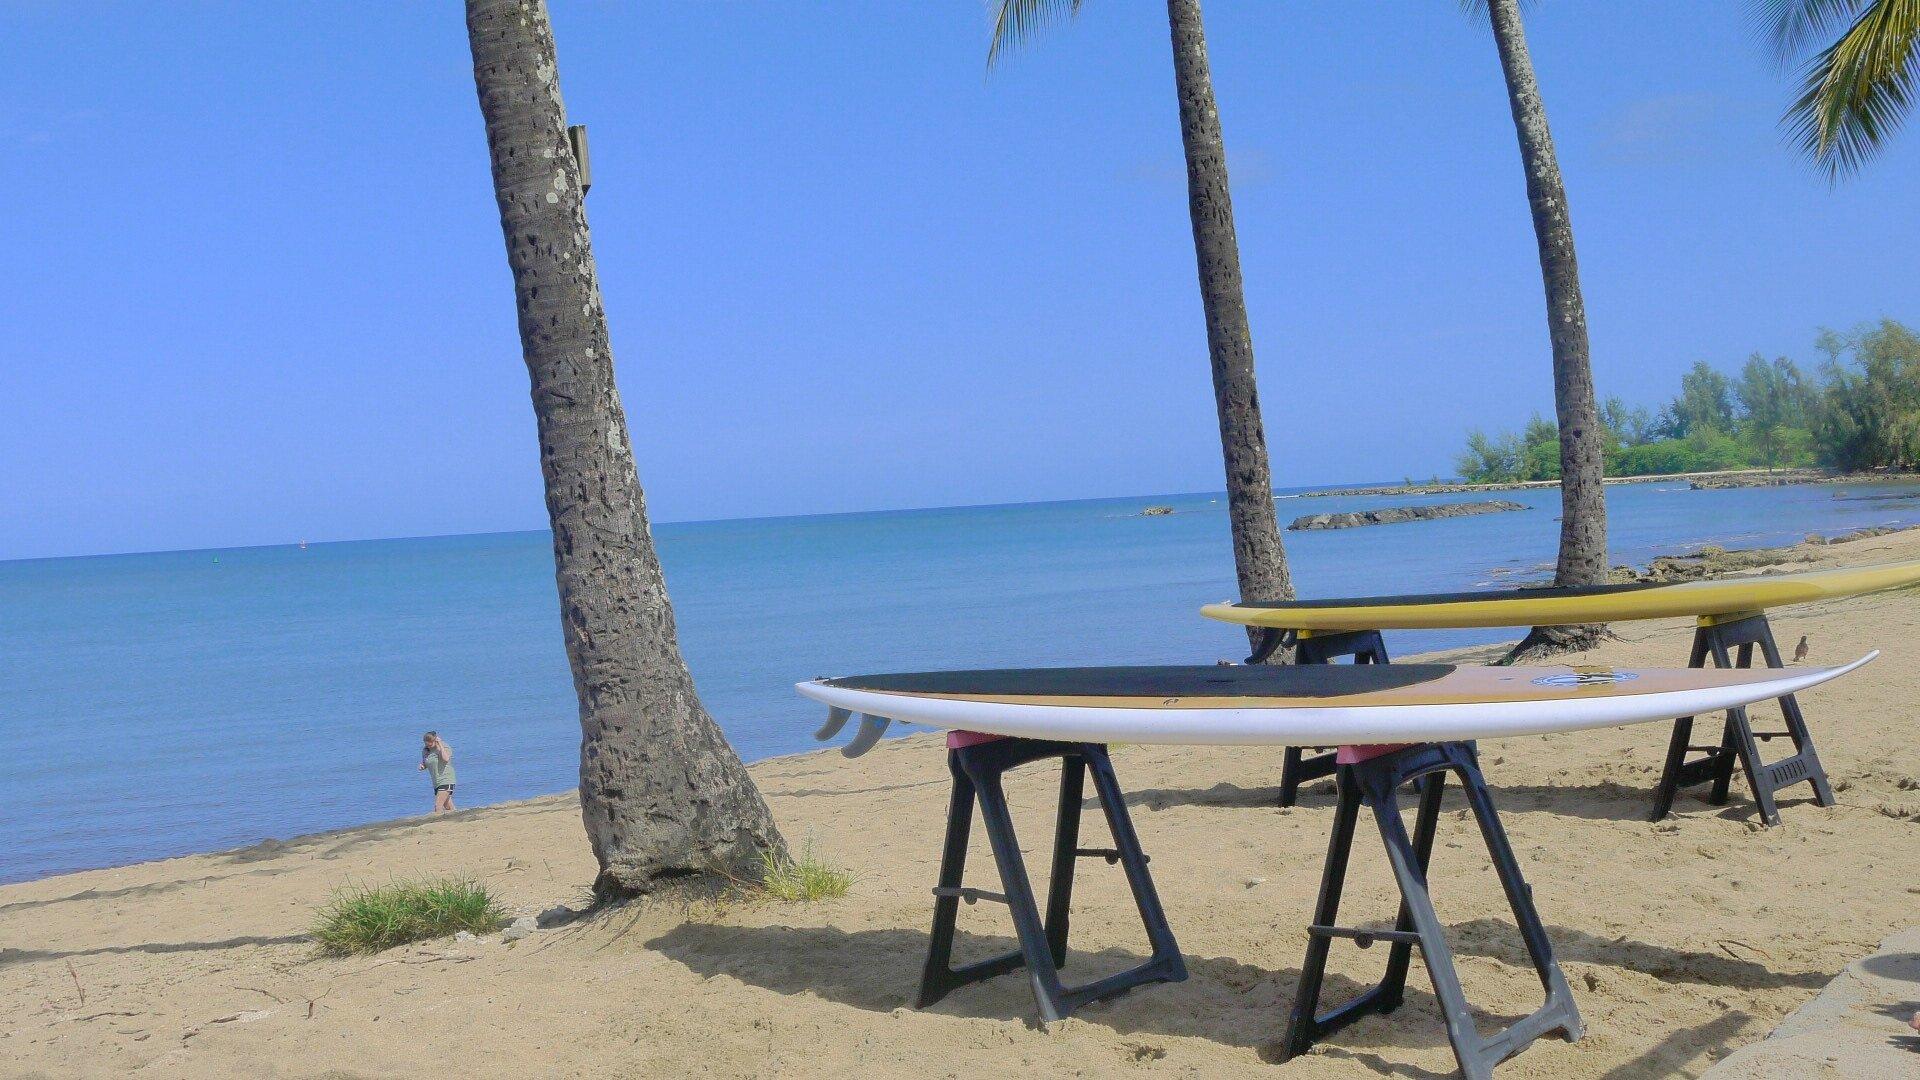 Notre voyage à HAWAII